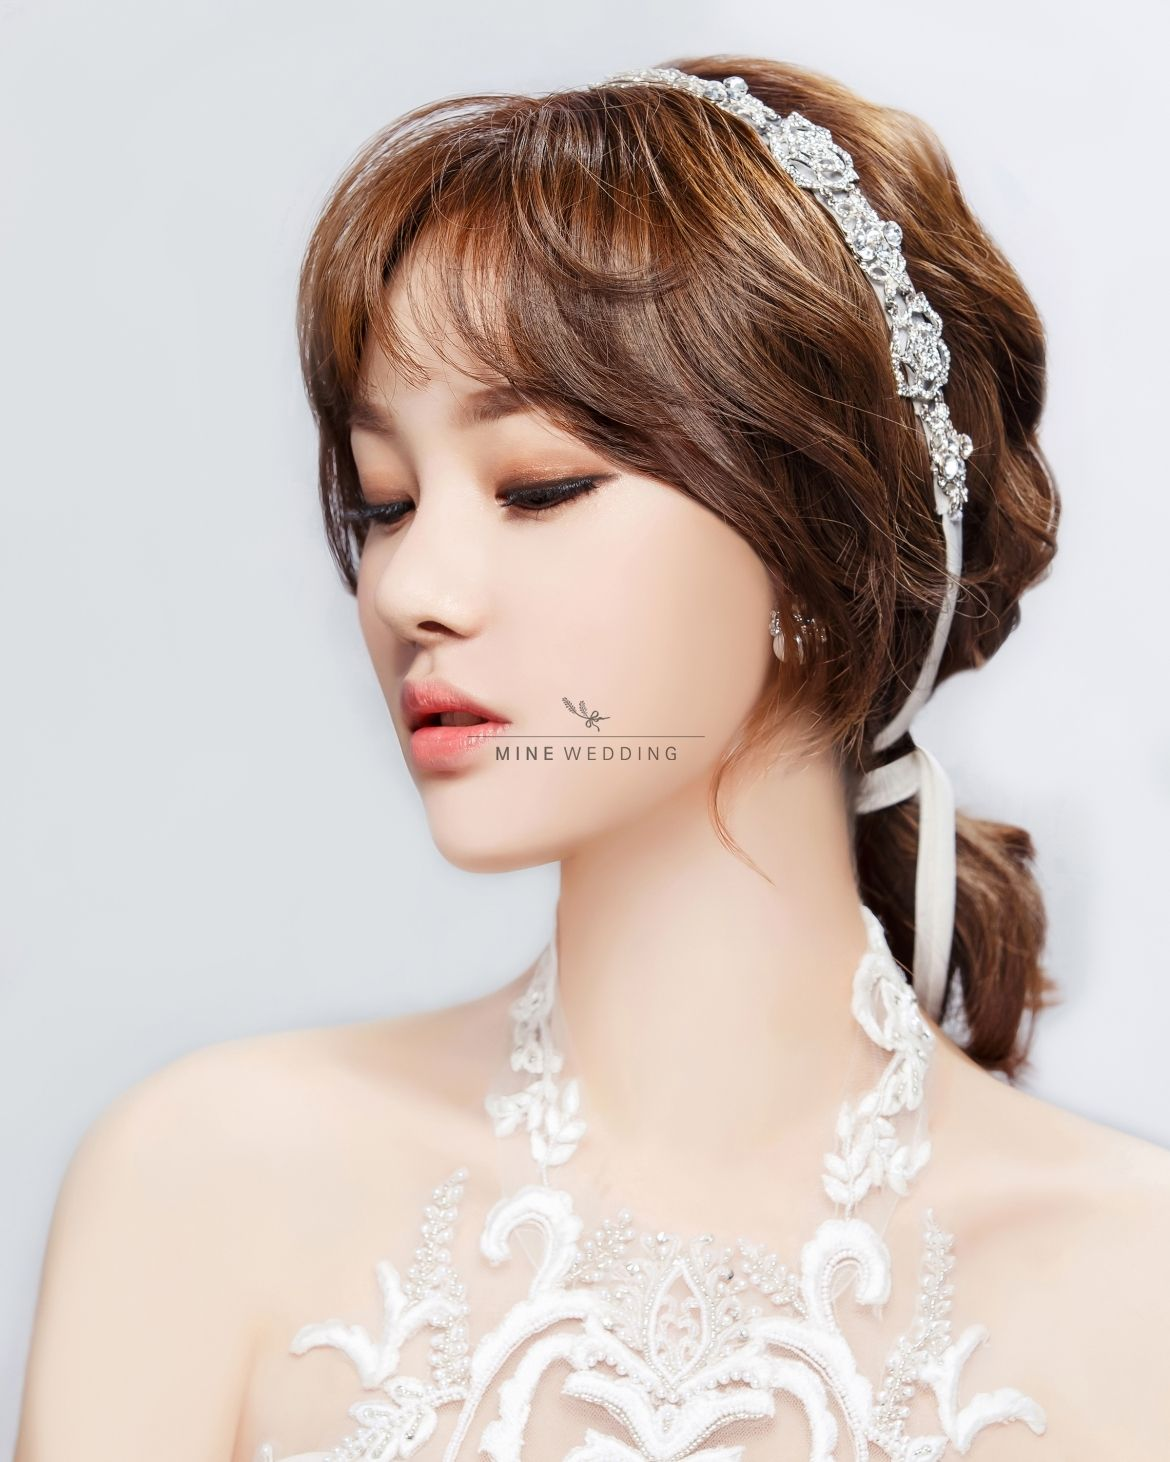 Korea Wedding Makeup Hair Styling Photography Model Rambut Pengantin Rambut Pengantin Pengantin